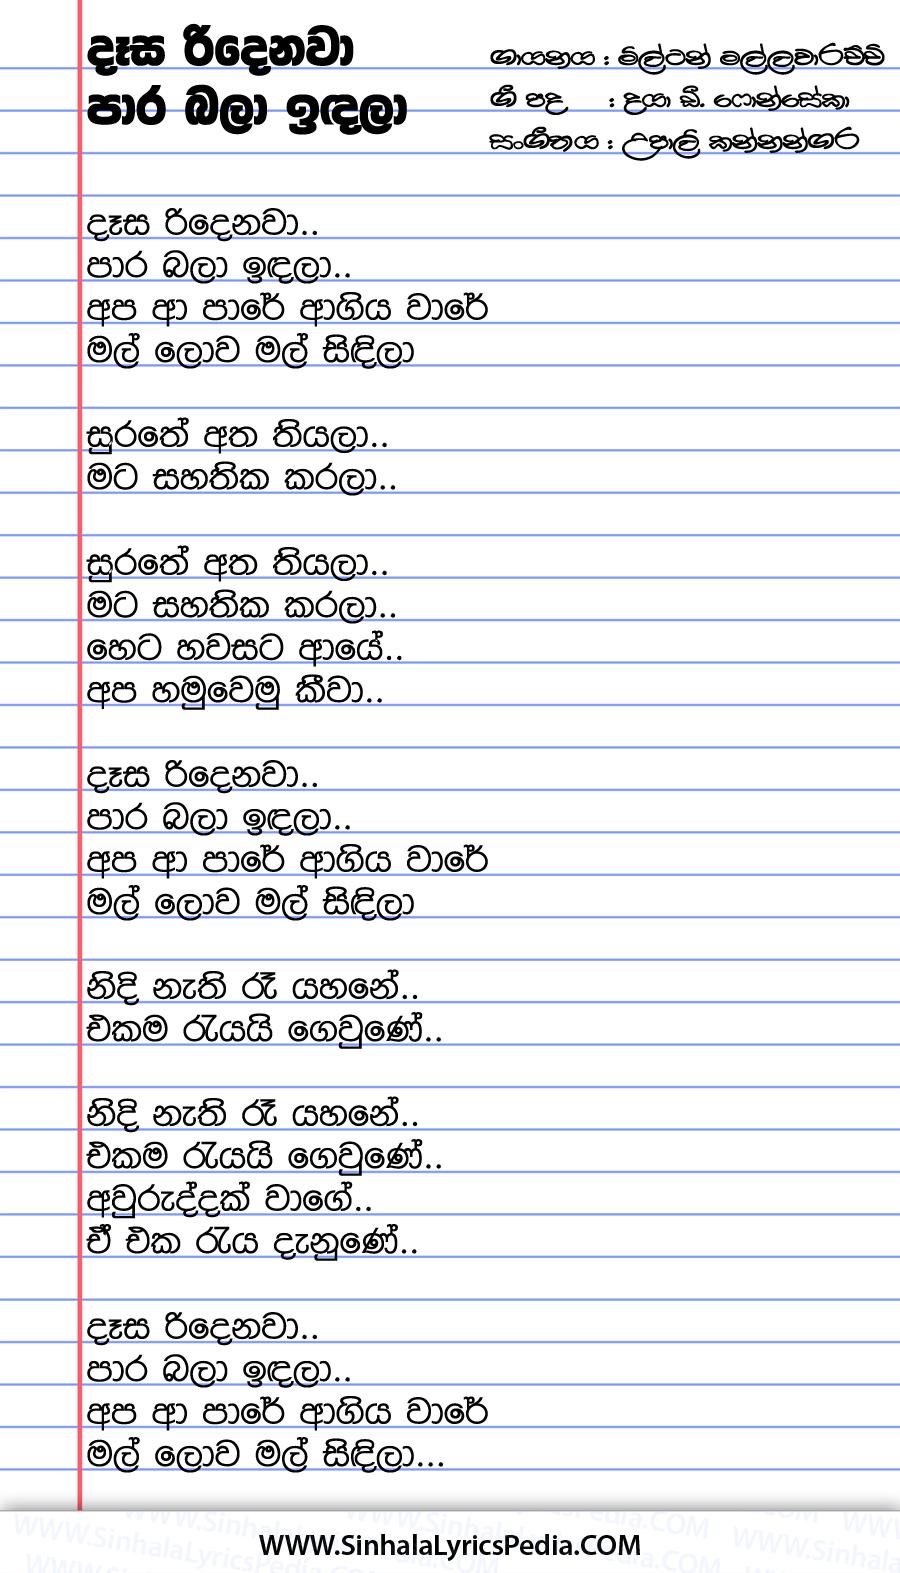 Dasa Ridenawa Para Bala Idala Song Lyrics